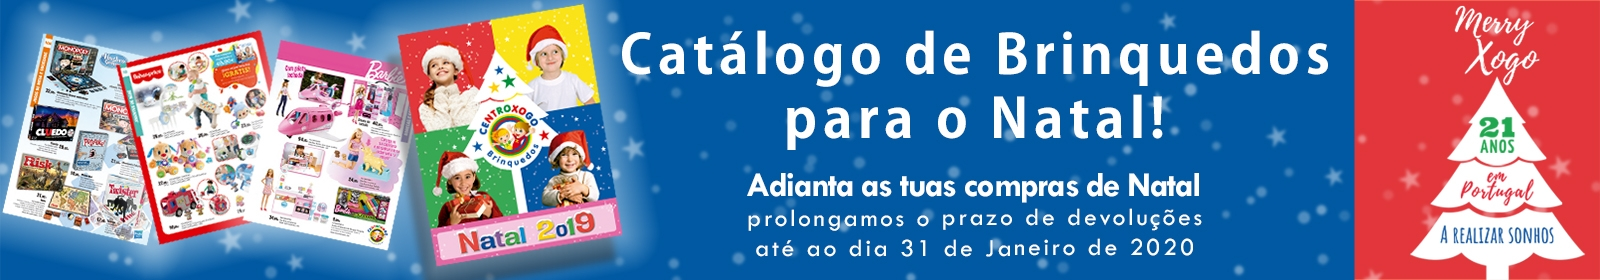 comprar Presentes de Natal online